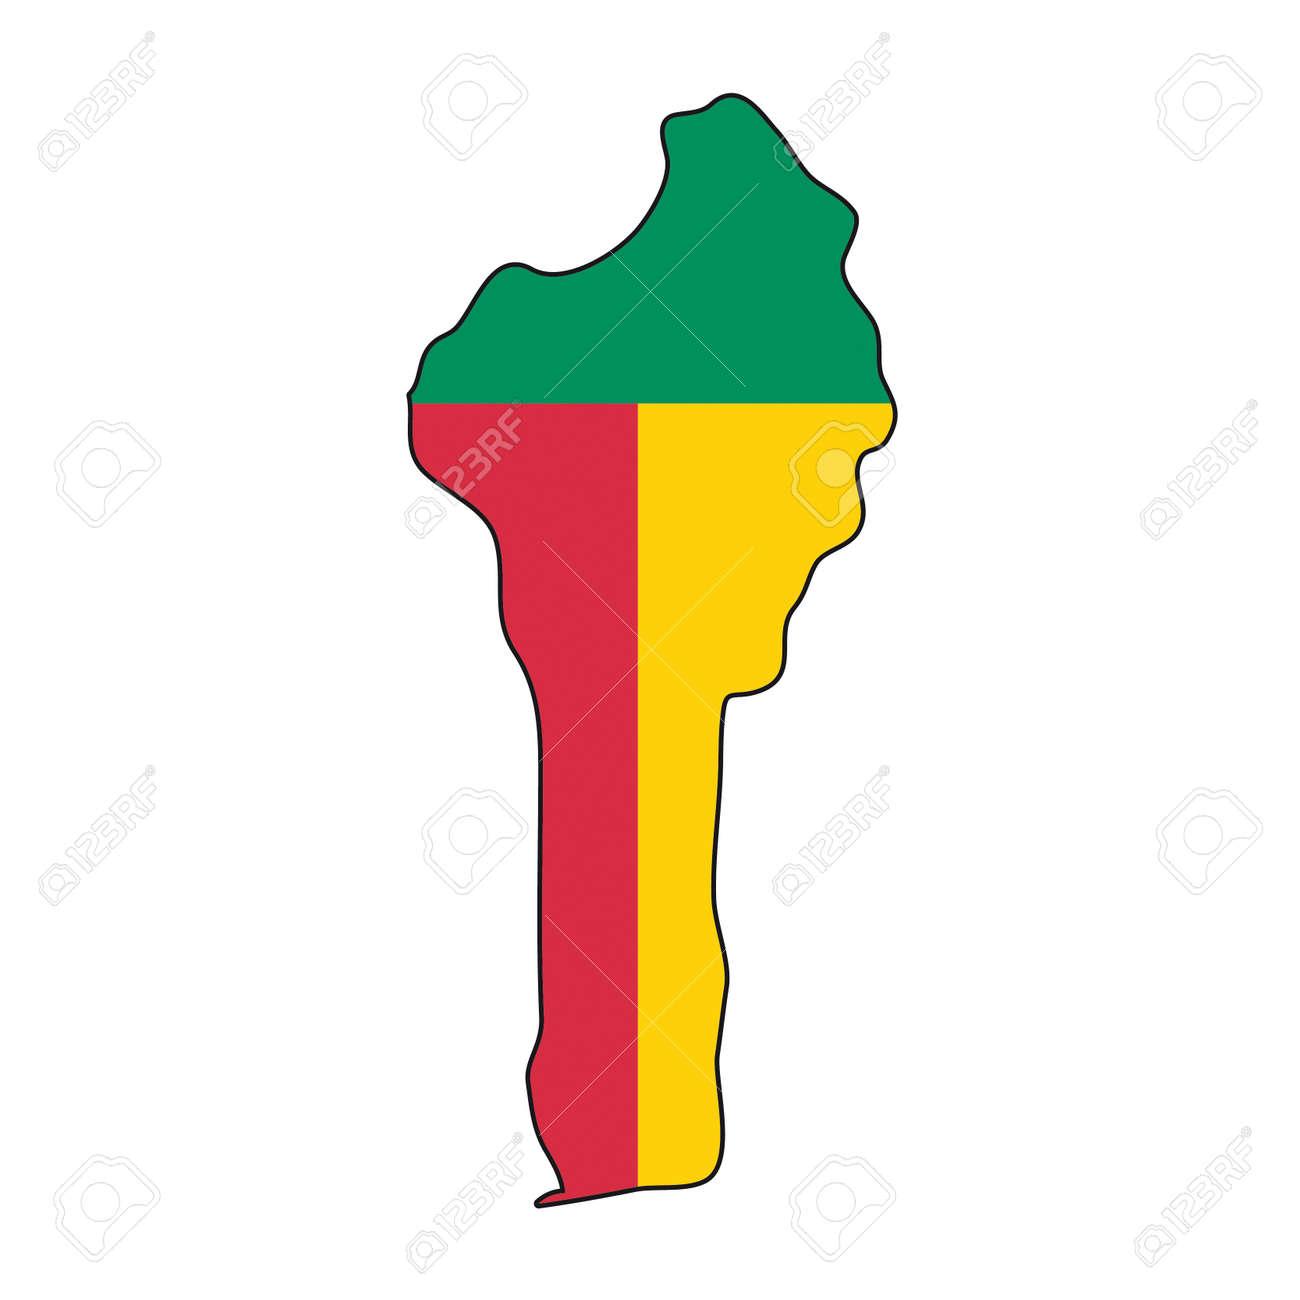 map flag Benin Stock Vector - 10637979